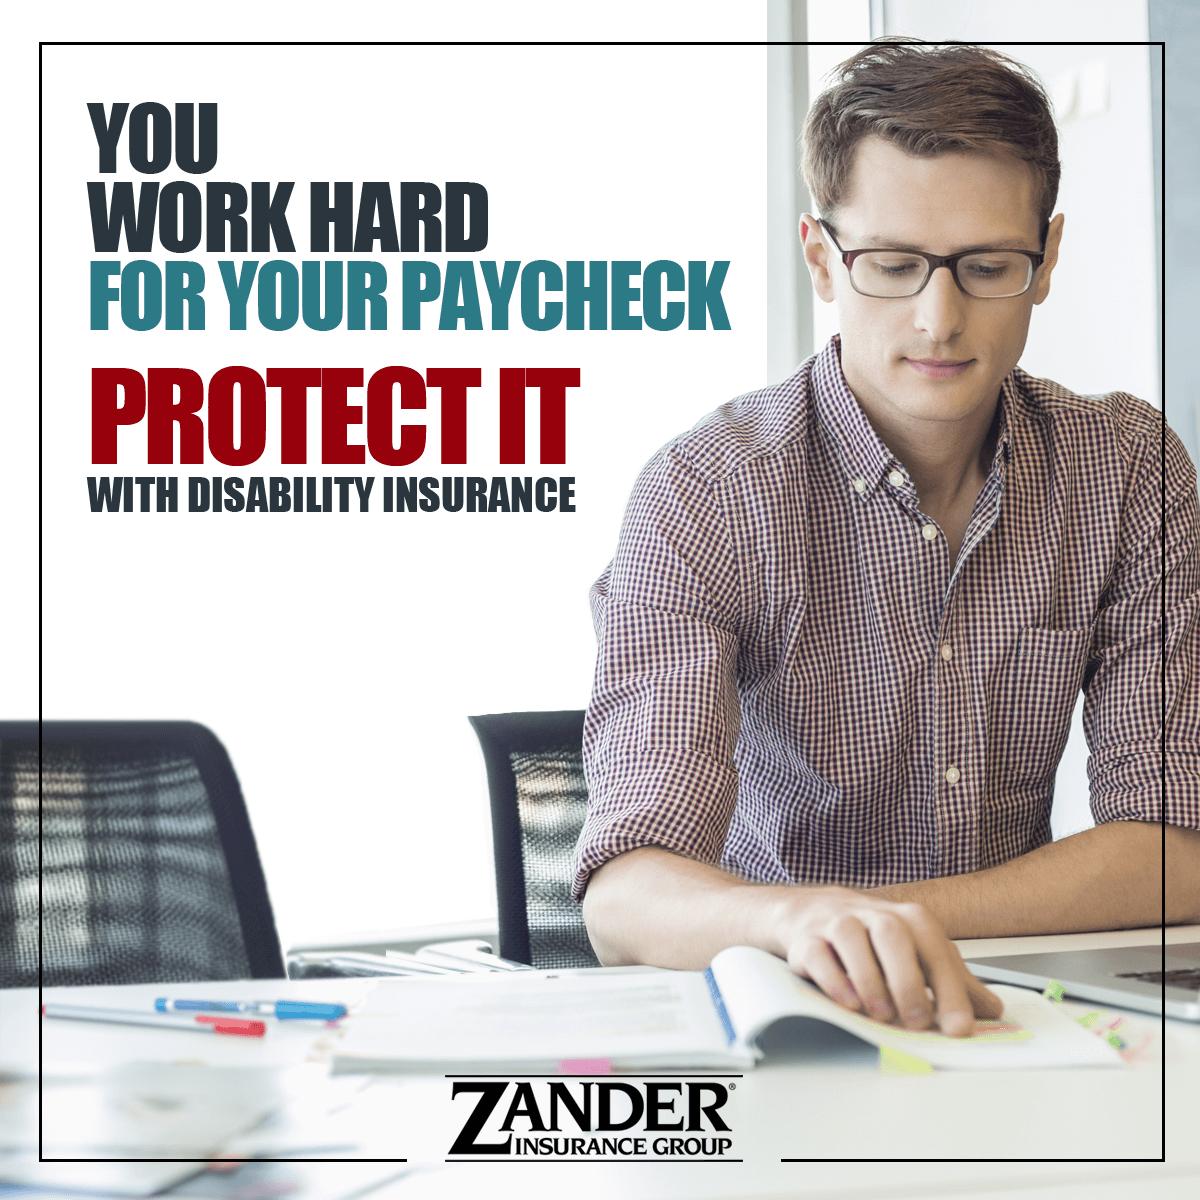 Pin by Zander Insurance on Insurance Tips Mens tops